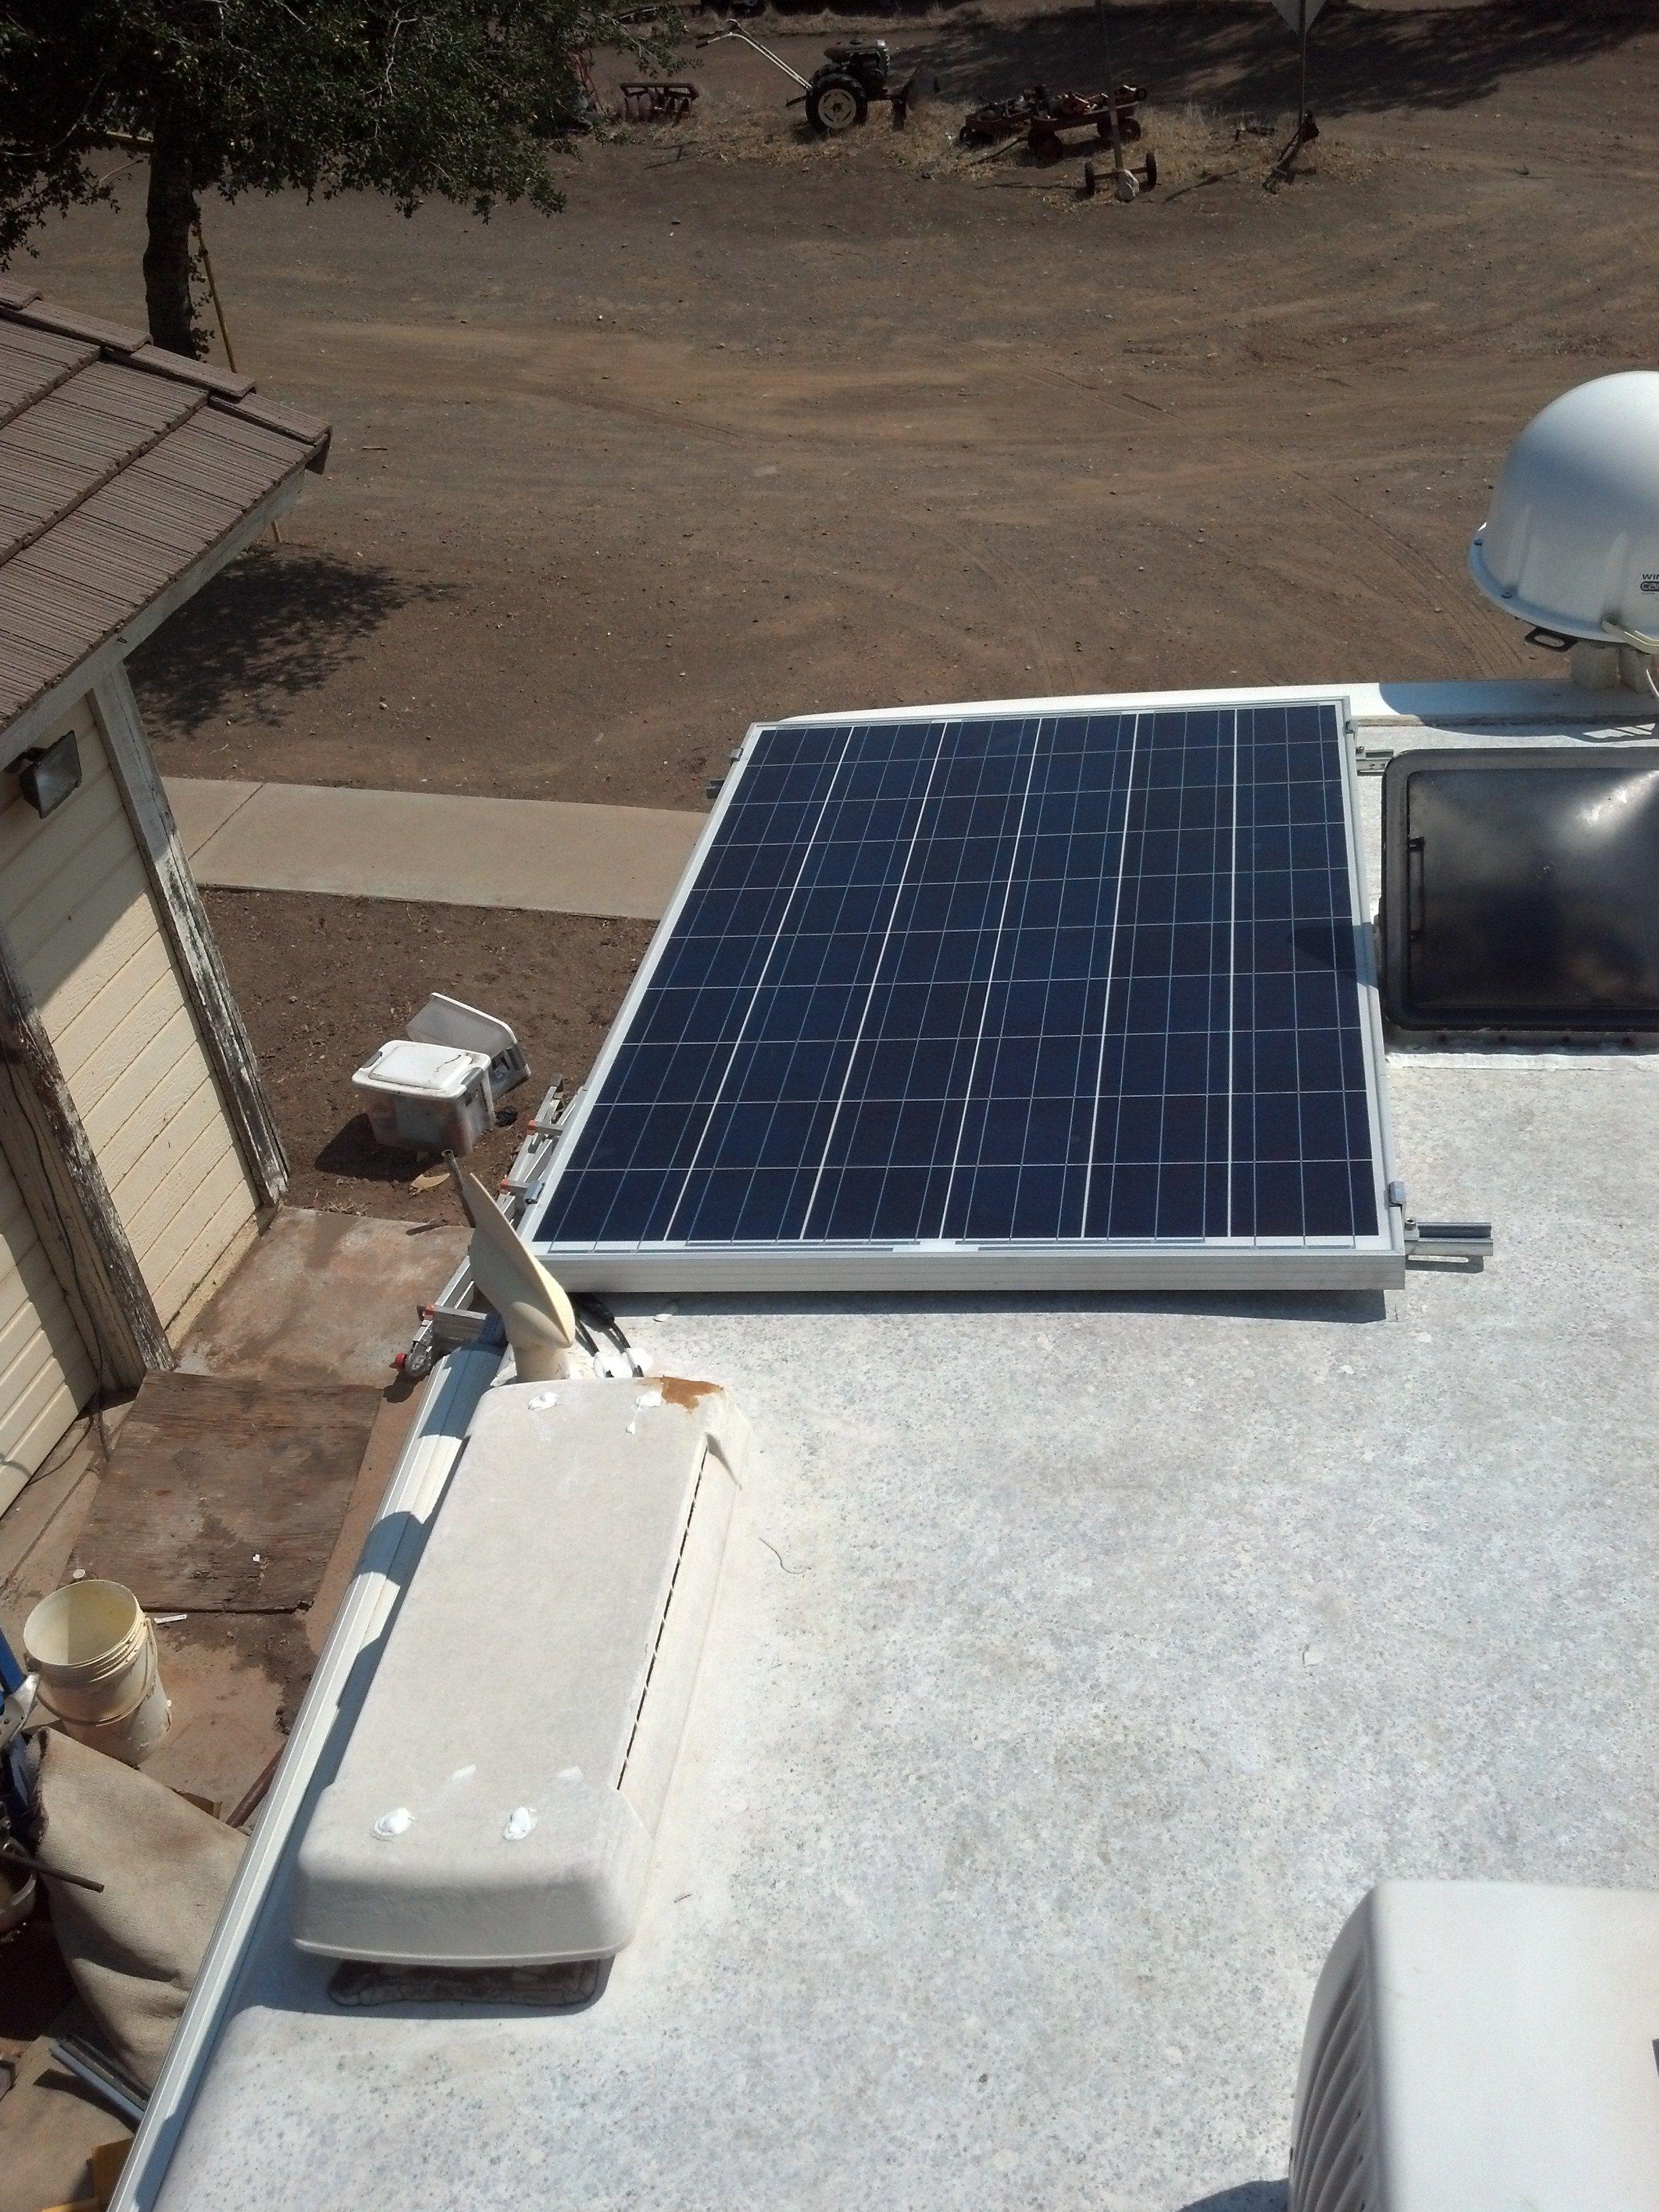 250 Watt Solar Panel On Rv 33 Open Volts Mounted On Unistrut Fed Through Regrig Vent Solar Panels Best Solar Panels Solar